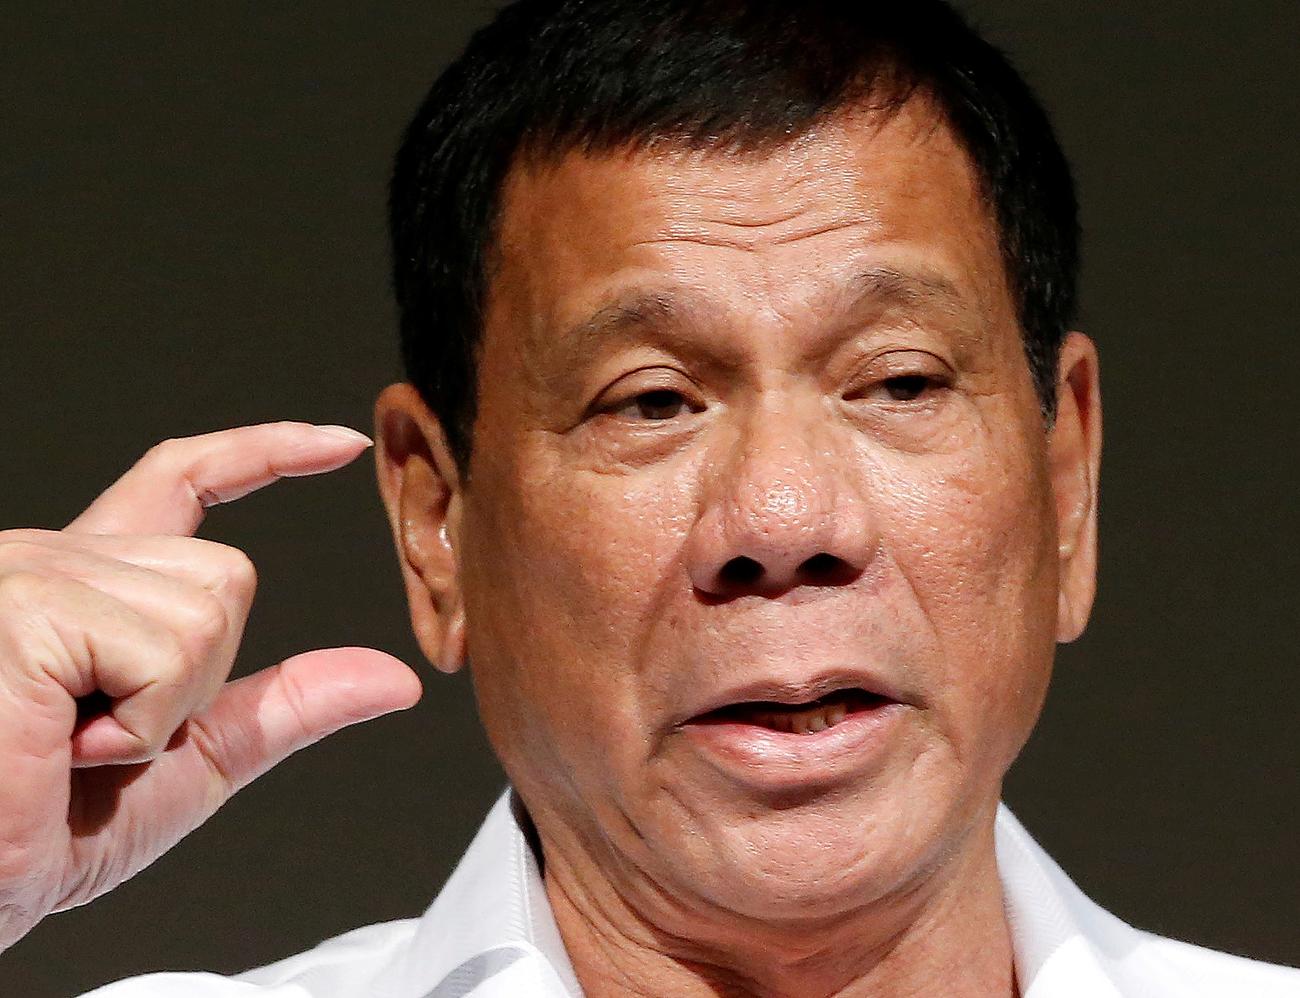 Philippine President Rodrigo Duterte delivers a speech at Philippines Economic Forum in Tokyo.